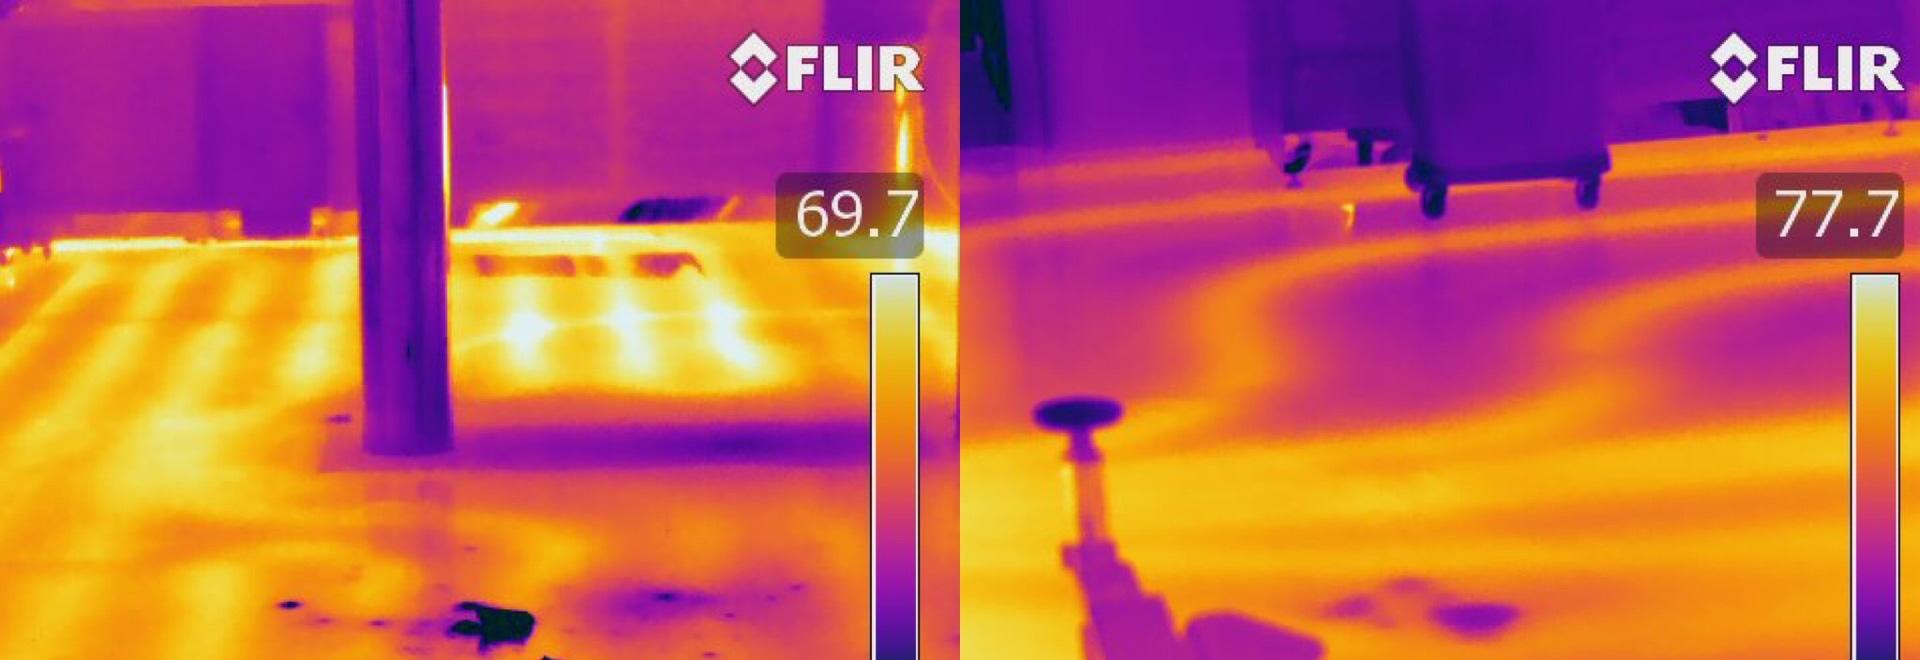 FLIR thermal images